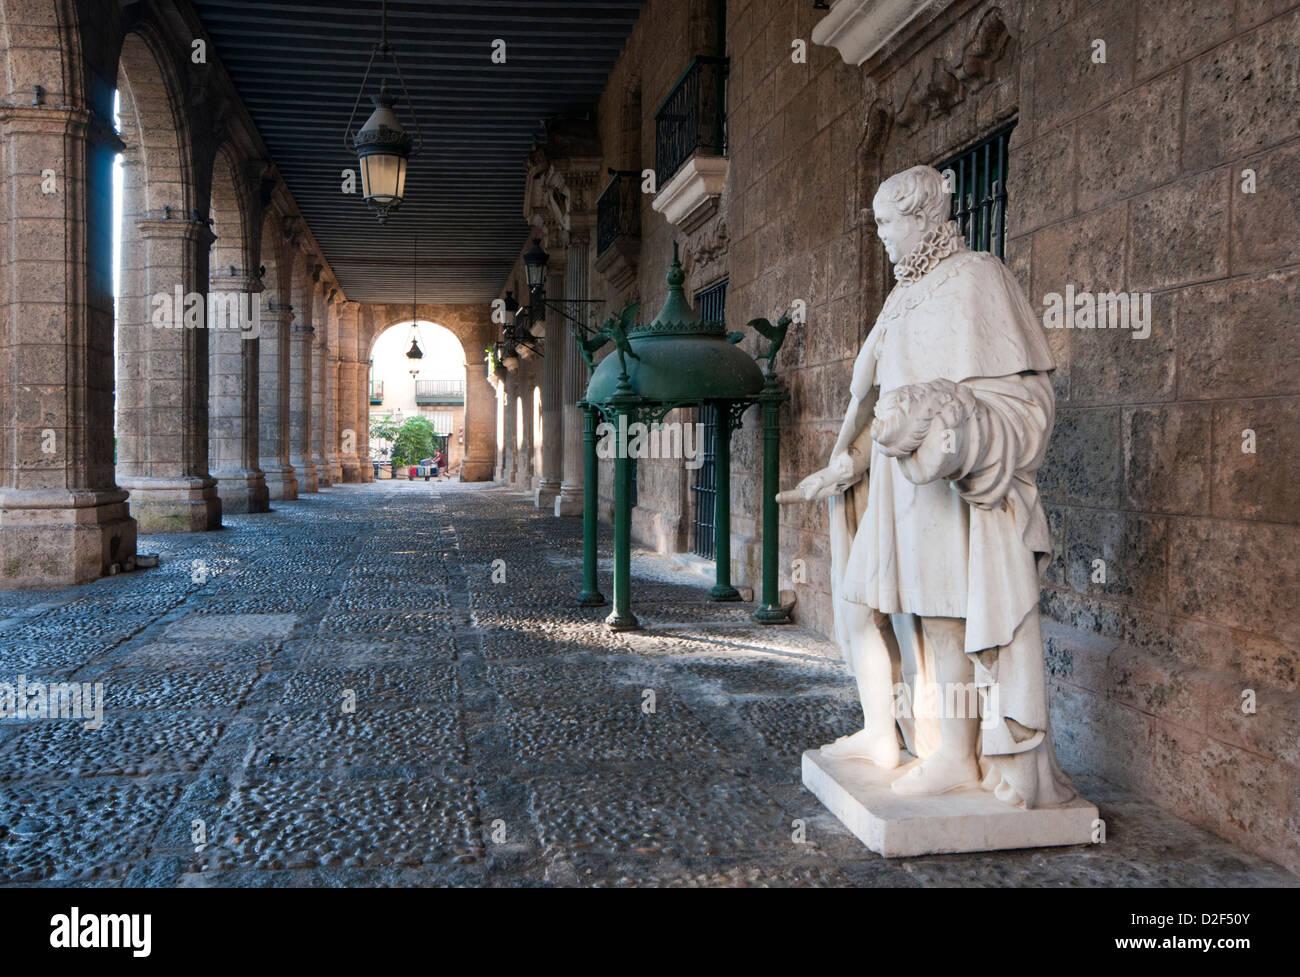 Sous les arcades de l'hôtel Palacio de los Capitanes Generales, Plaza de Armas, Habana Vieja, La Havane, Photo Stock